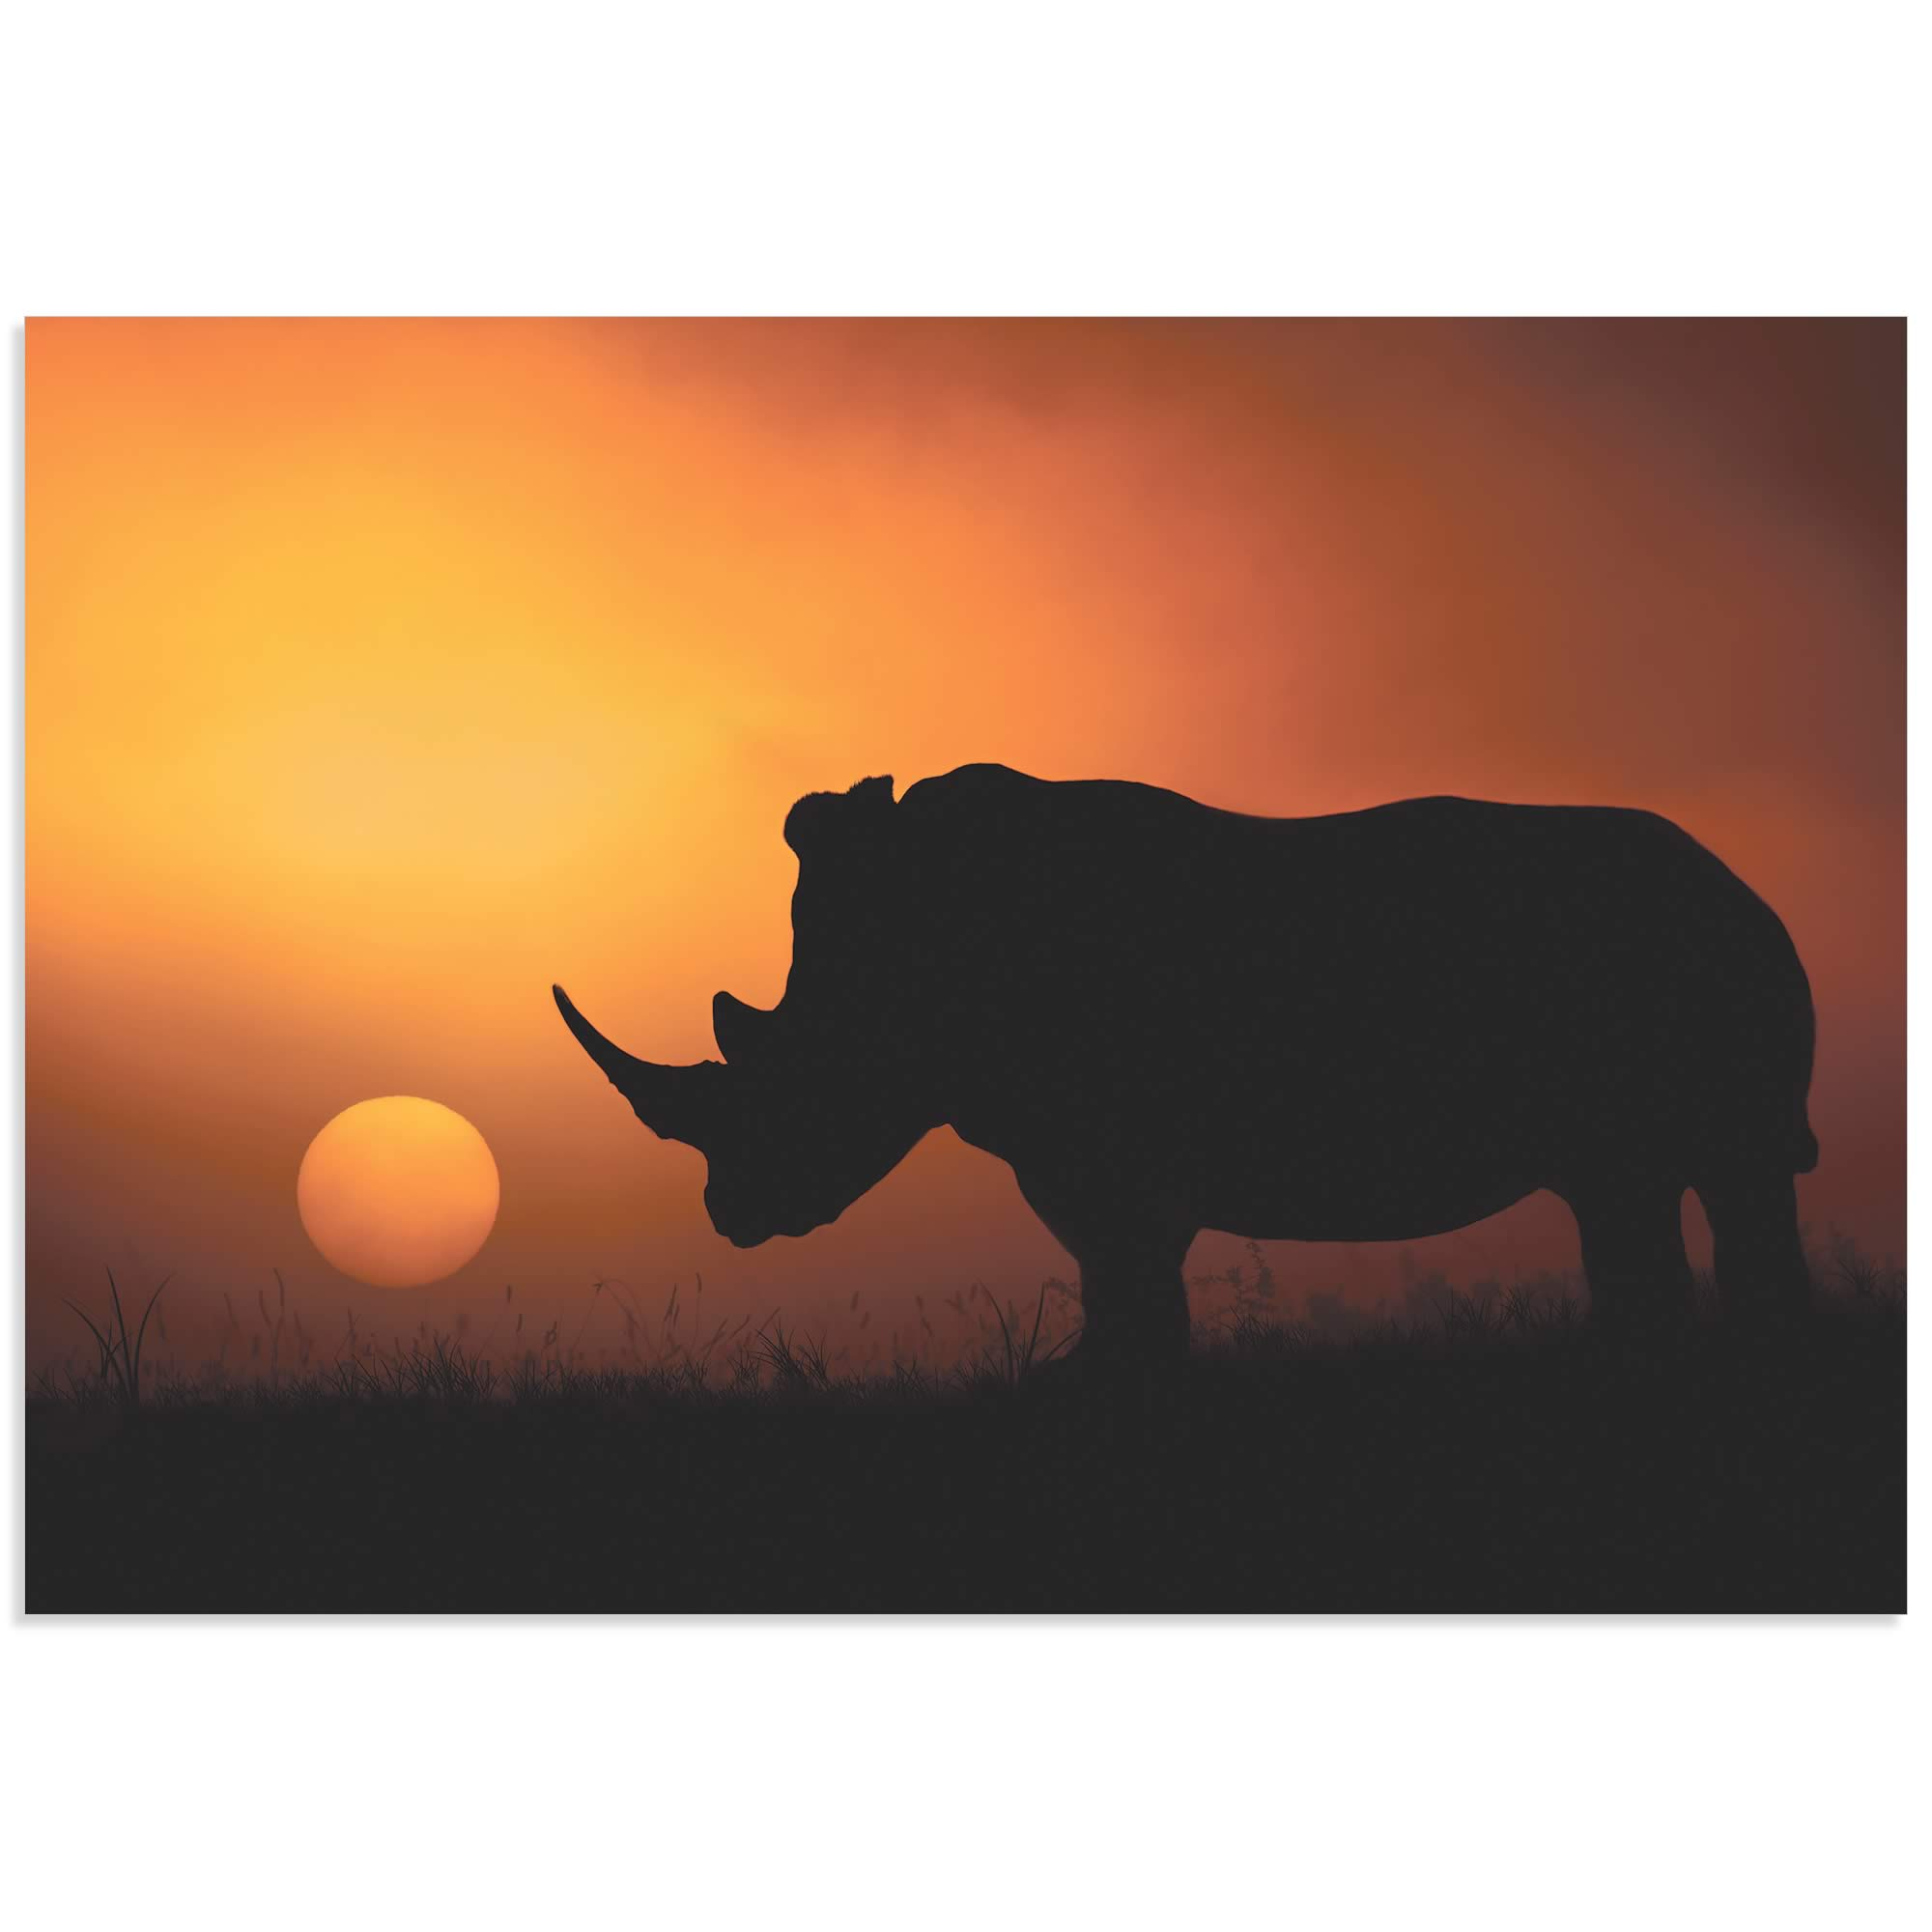 Rhino Sunrise by Mario Moreno - Rhino Silhouette Art on Metal or Acrylic